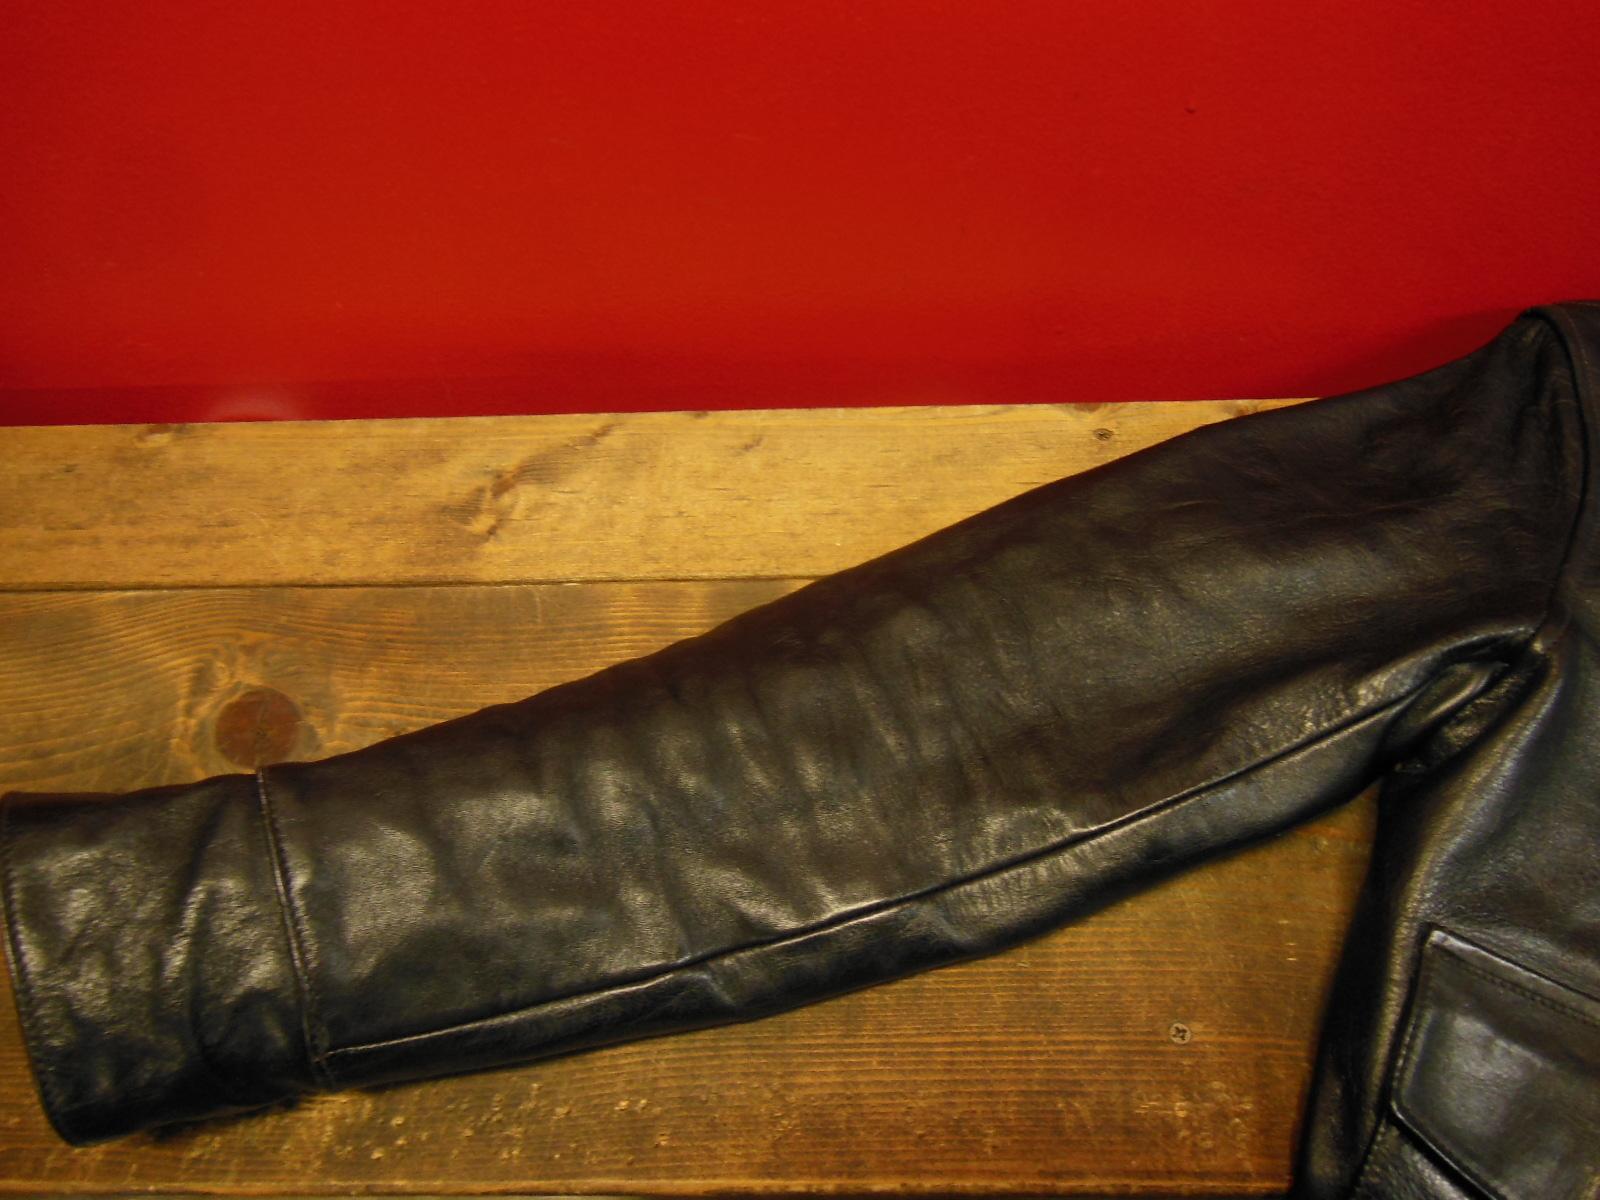 USED HIMEL BROTHERS LEATHER HERON 1929/新喜皮革製黒ホースハイド/SIZE-36/ボタンフロント A-1 ジャケット_c0187684_15080951.jpg